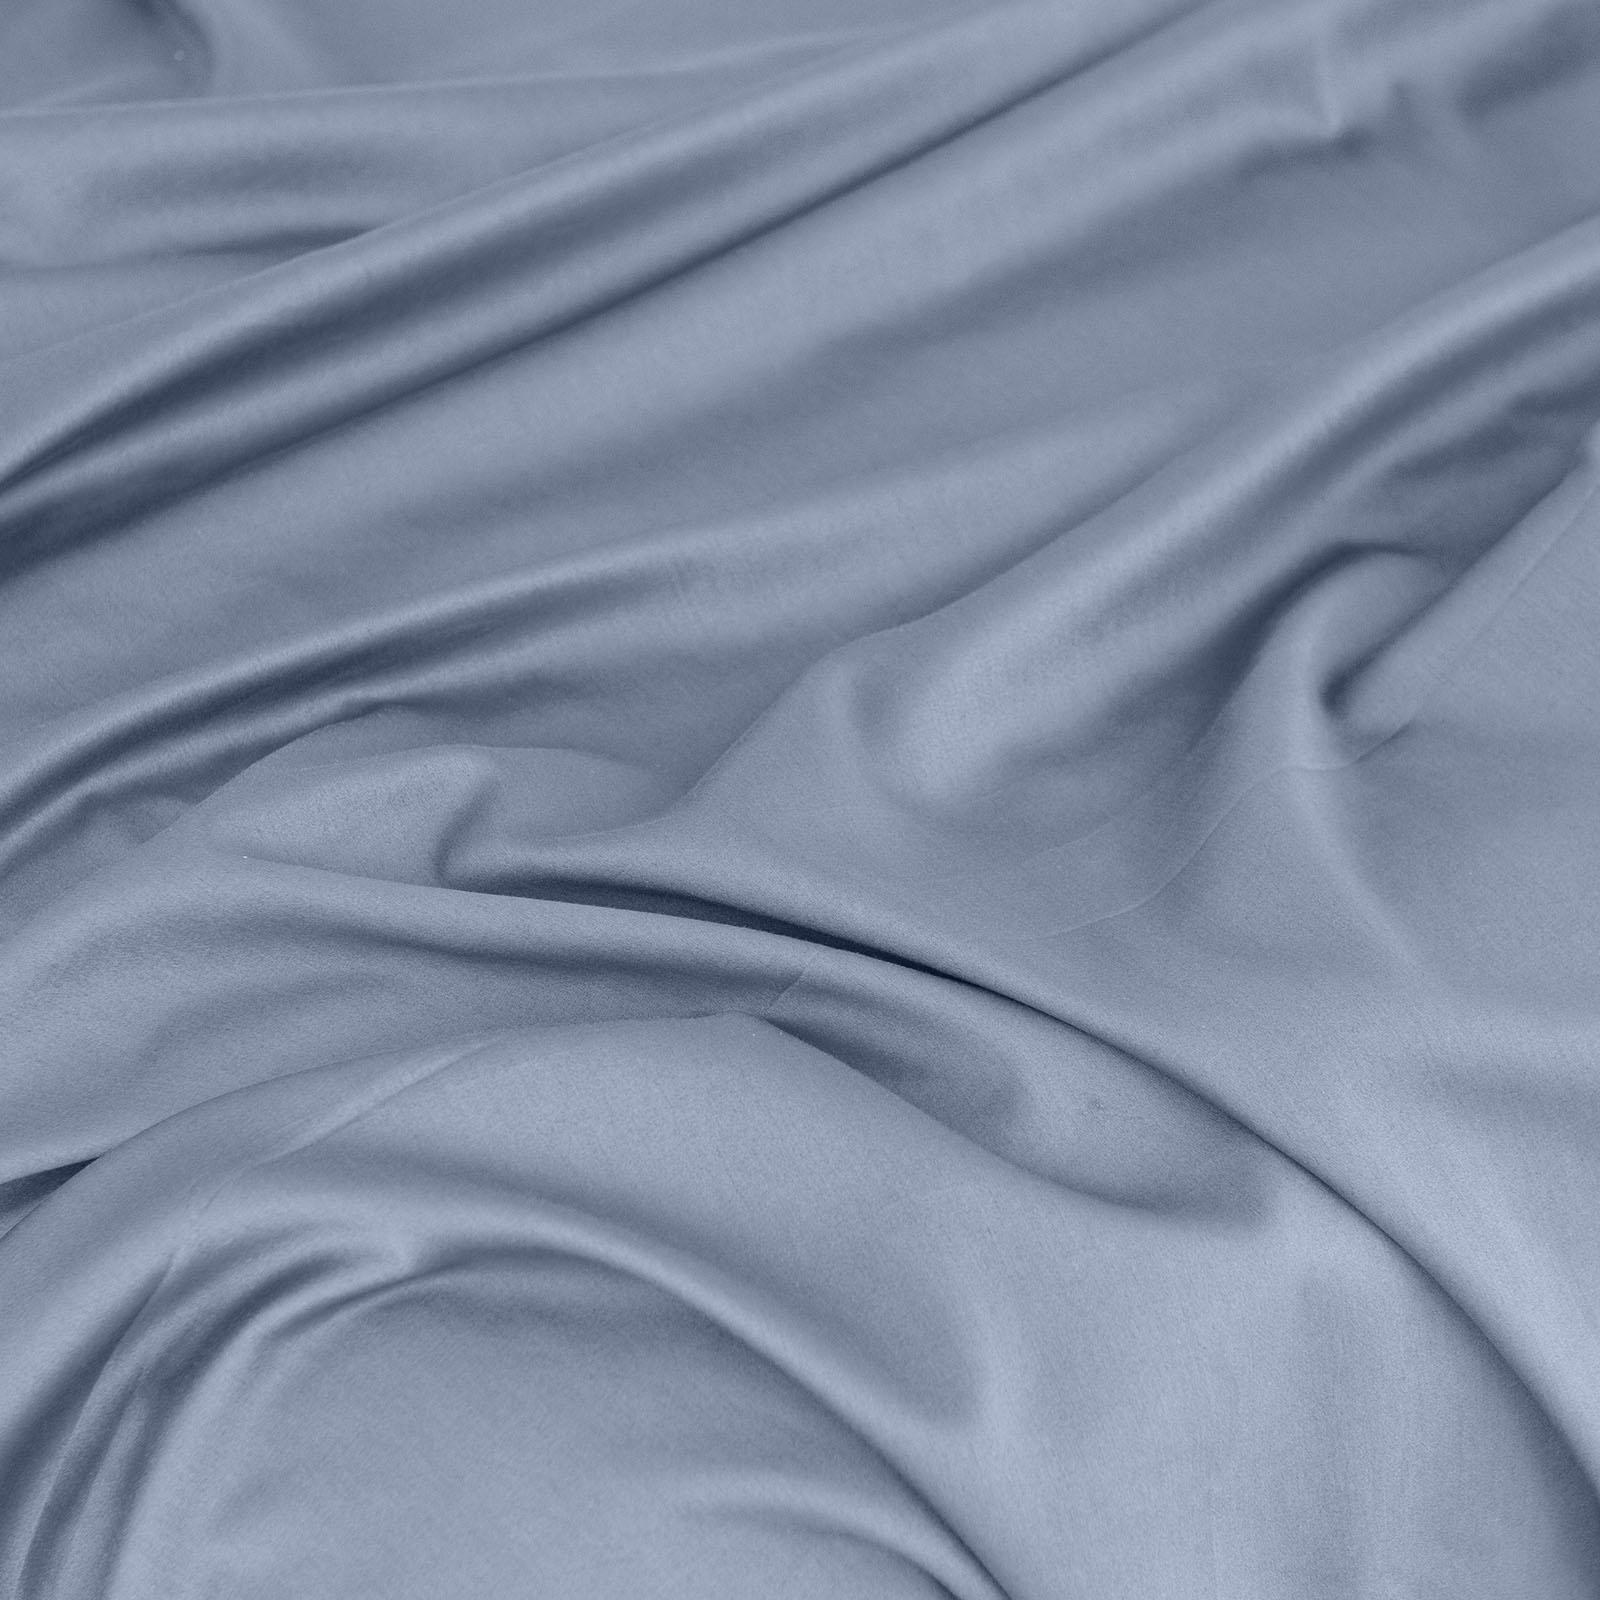 thumbnail 14 - Royal Comfort 1000TC Hotel Grade Bamboo Cotton Sheets Pillowcases Set Ultrasoft